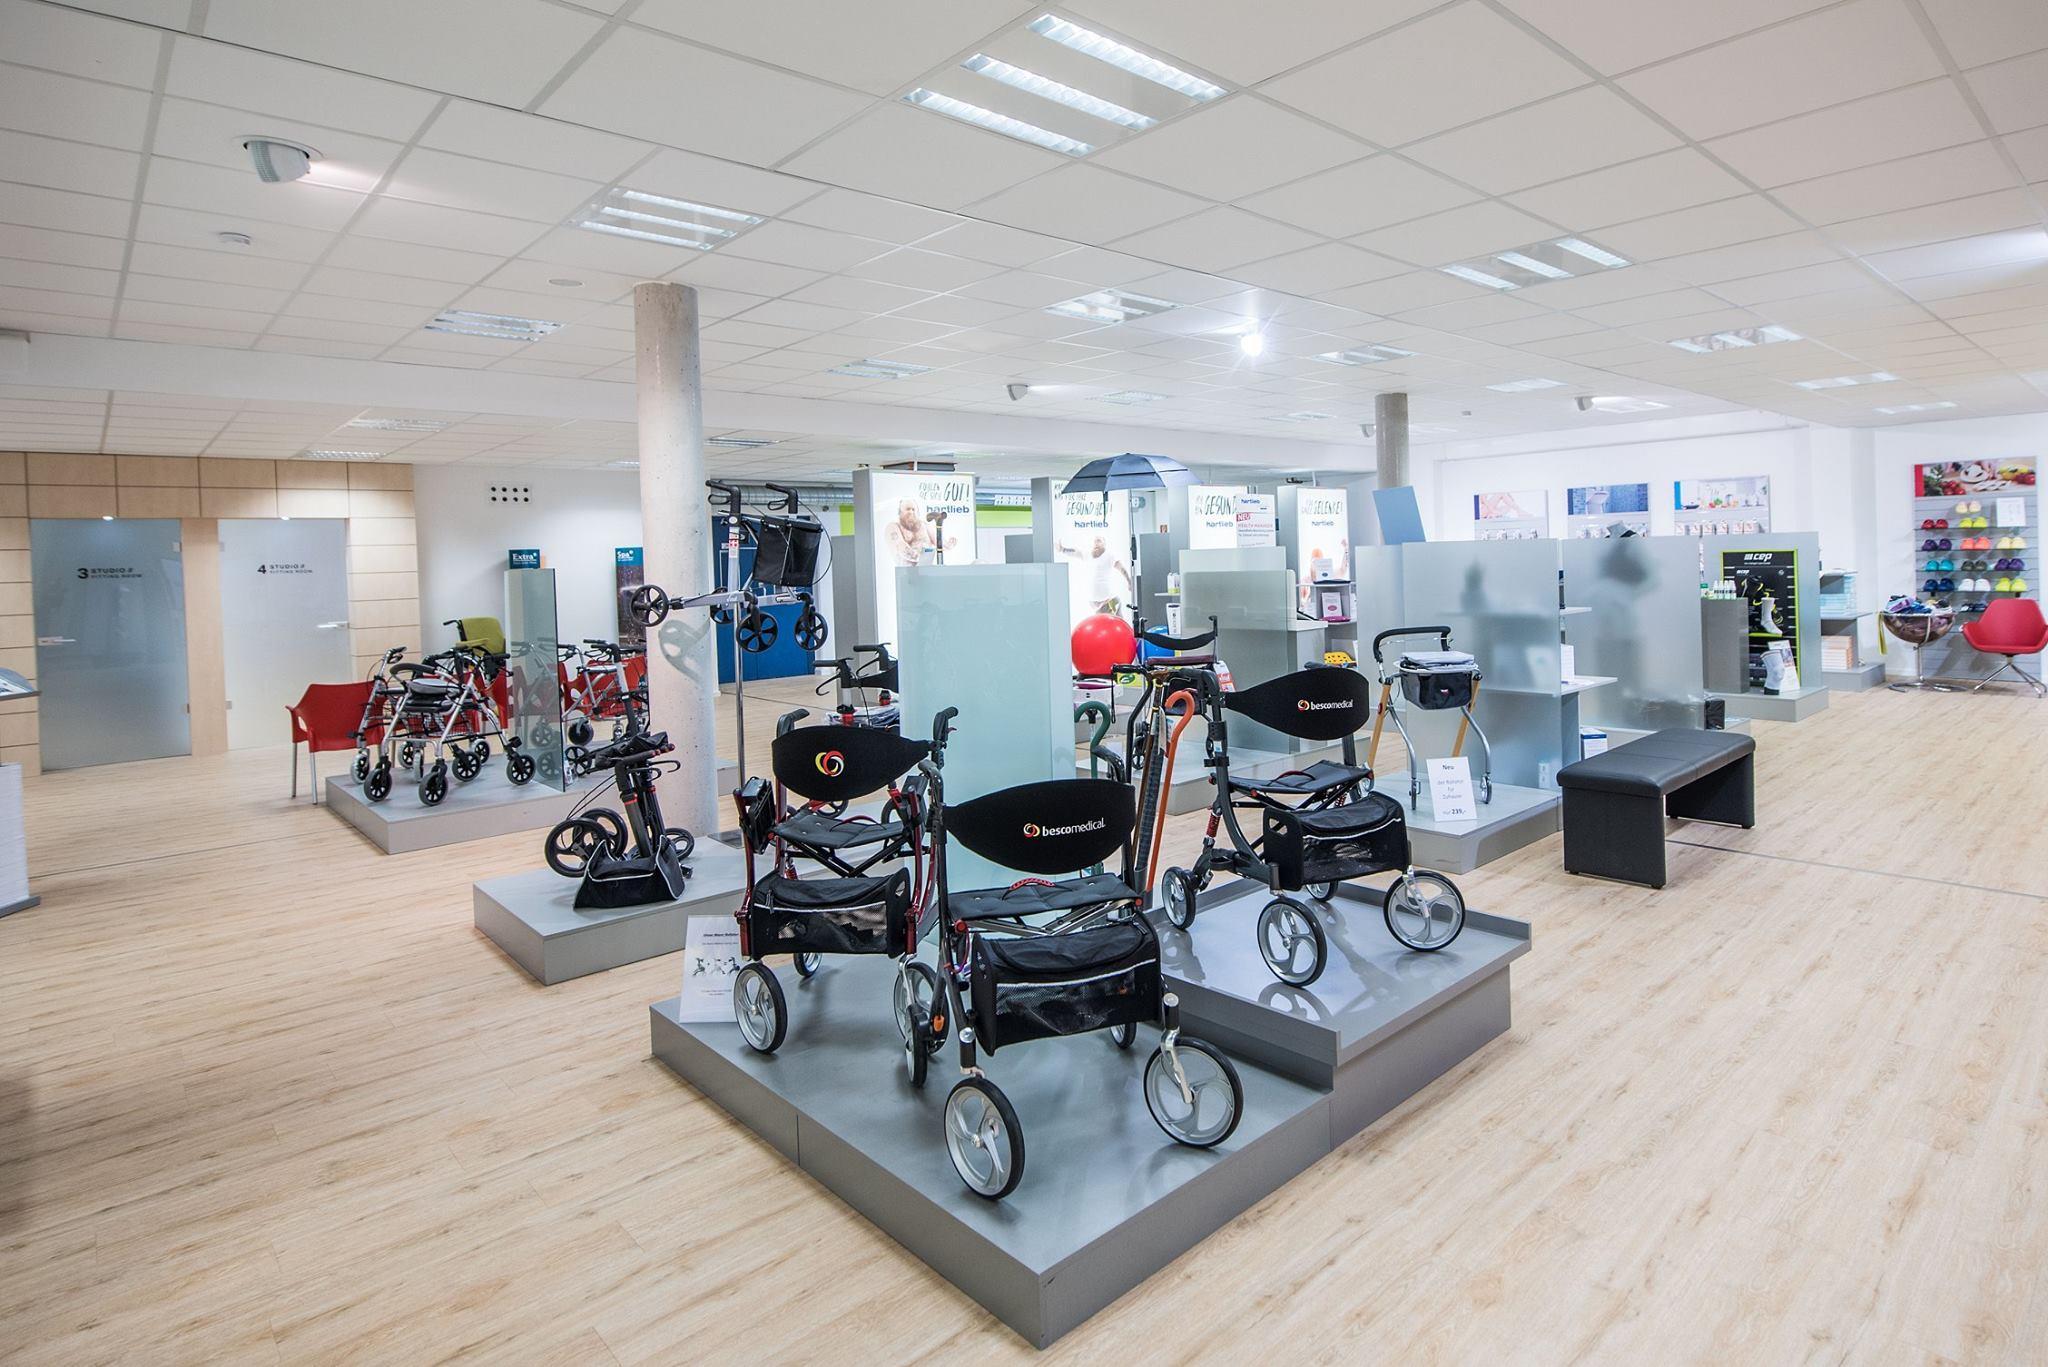 Hartlieb Orthopädie- & Reha-Technik-Fachzentrum Neckar-Fils